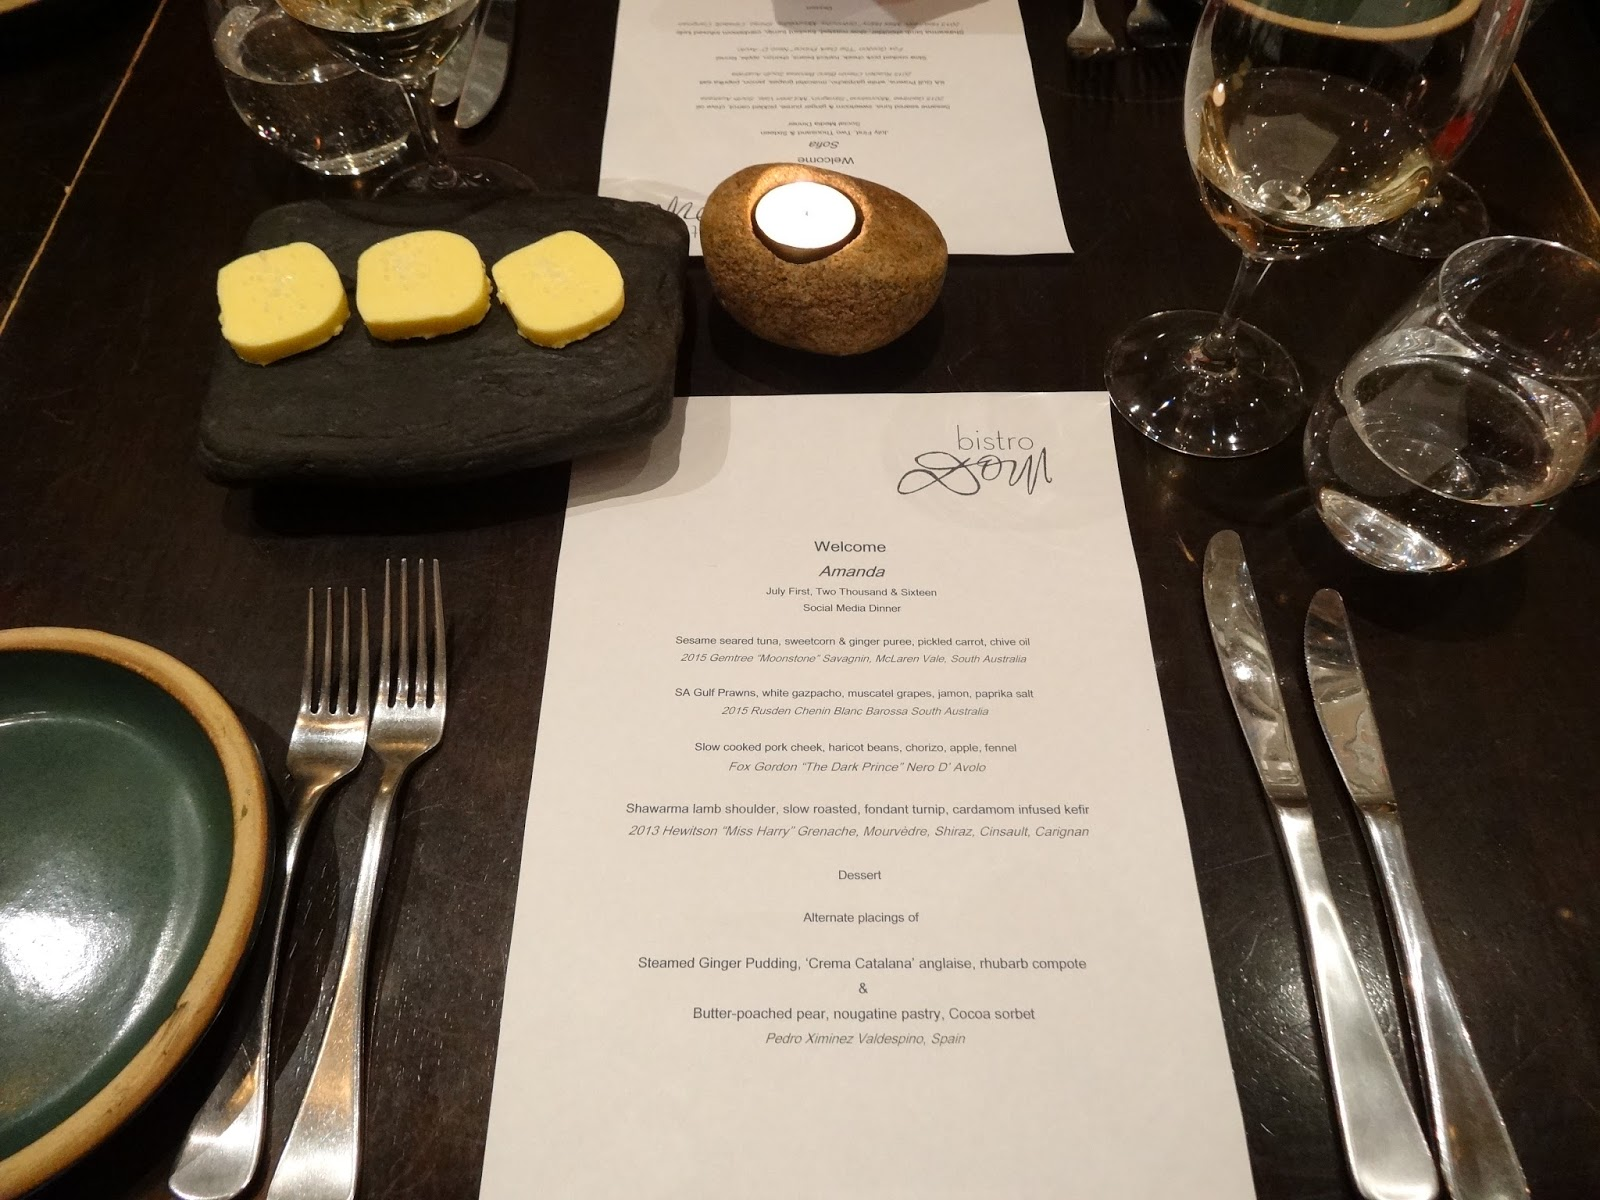 Bistro dom menu tasting degustation the chopping board for Table 52 menu